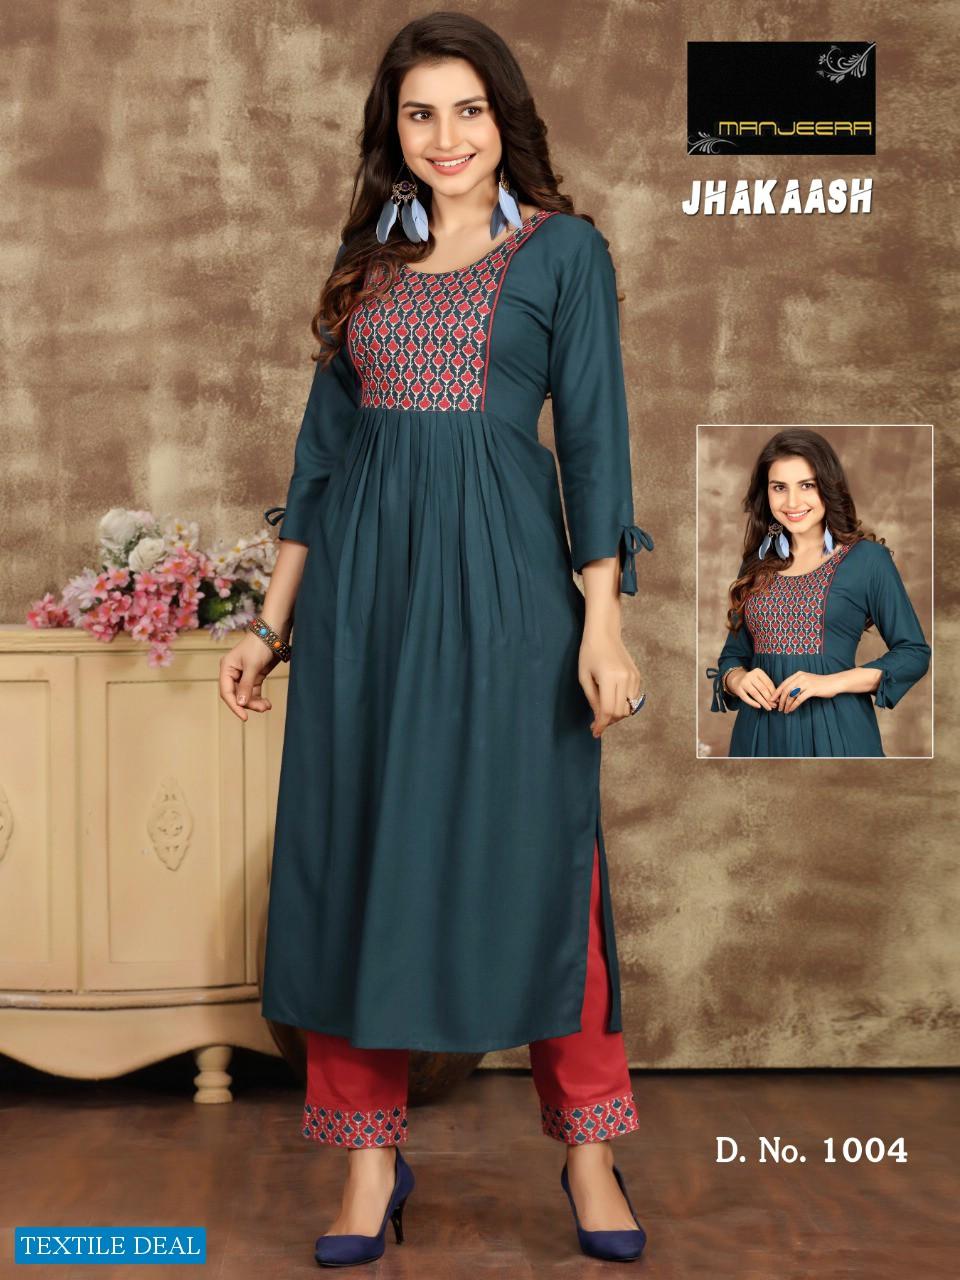 Manjeera Jhakaash Wholesale Readymade Kurti With Pants